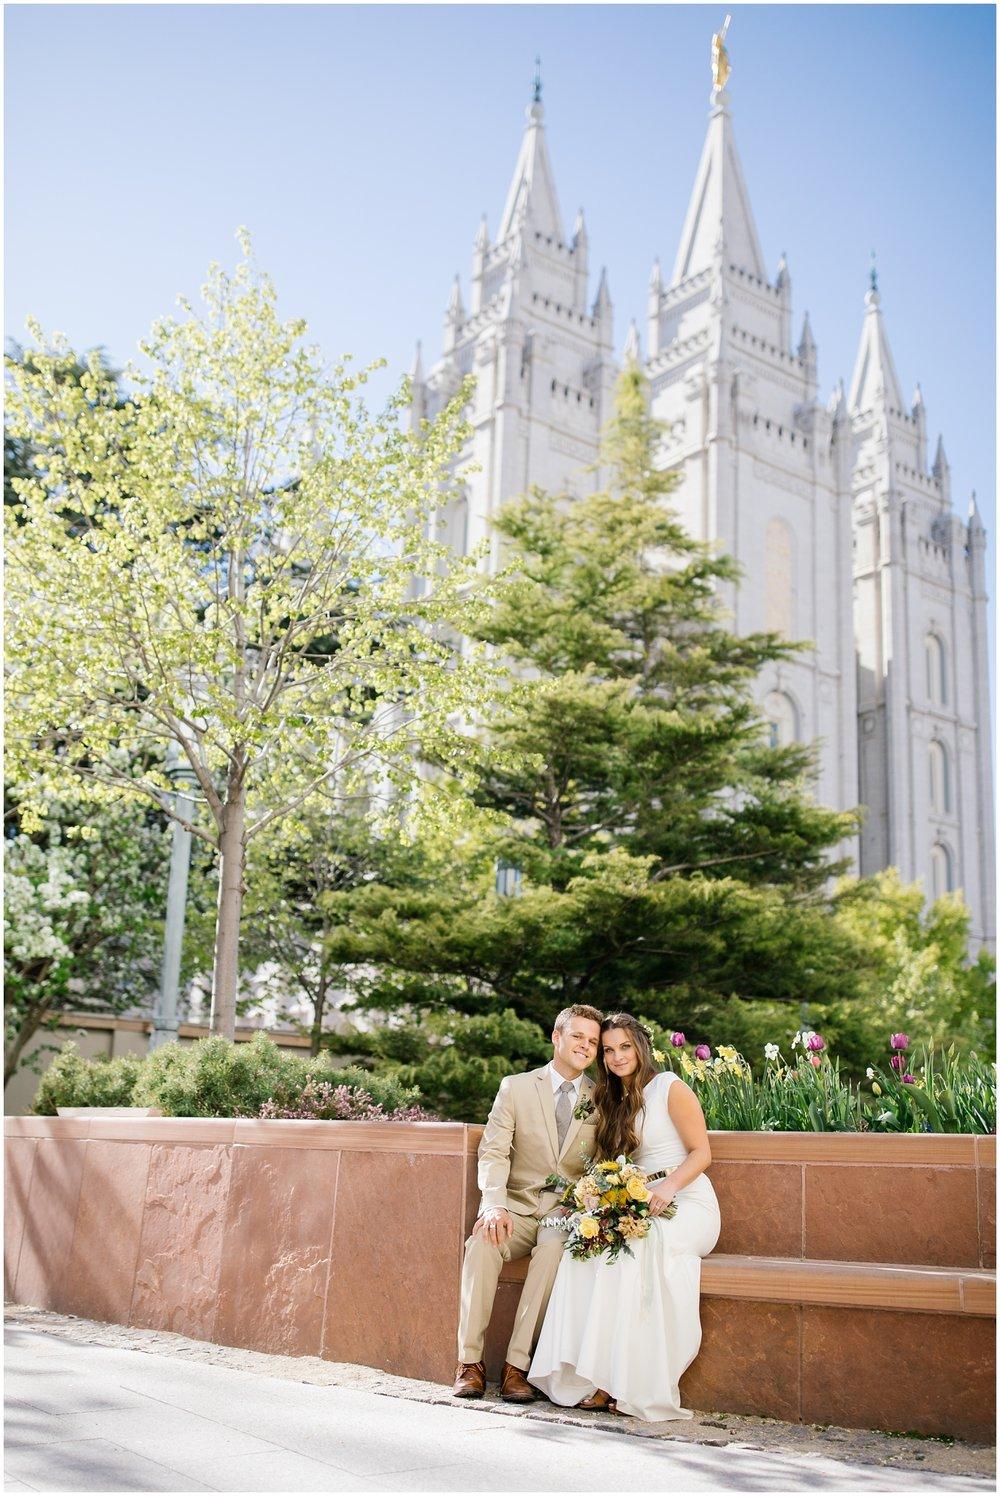 JC-Wedding-199_Lizzie-B-Imagery-Utah-Wedding-Photographer-Park-City-Salt-Lake-City-Temple-Joseph-Smith-Memorial-Building-Empire-Room.jpg